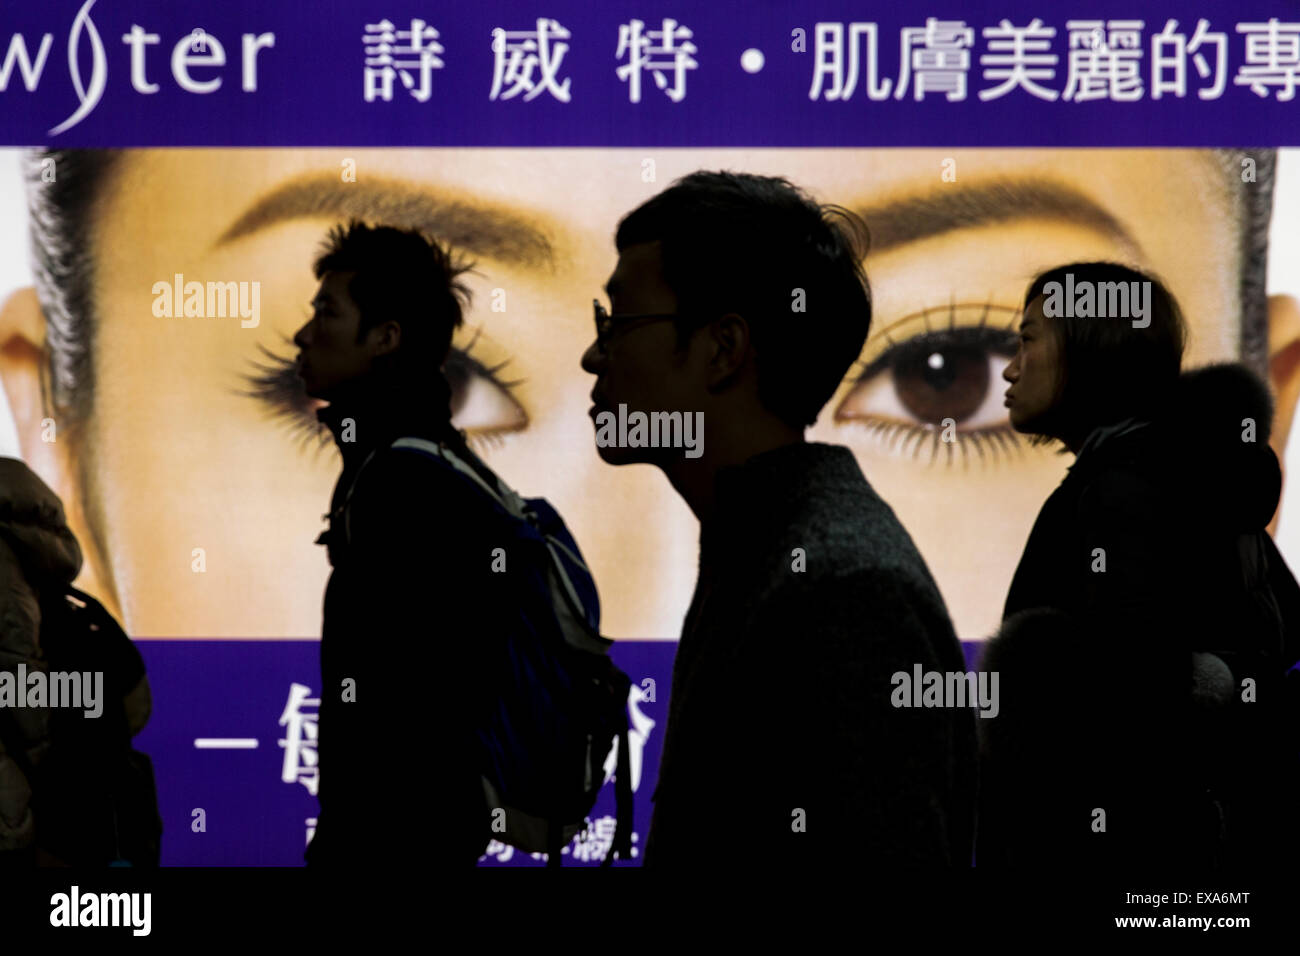 Asia, Taiwan, Taipei, Silhouette of passengers walking past illuminated billboard of Chinese woman's eyes inside Stock Photo